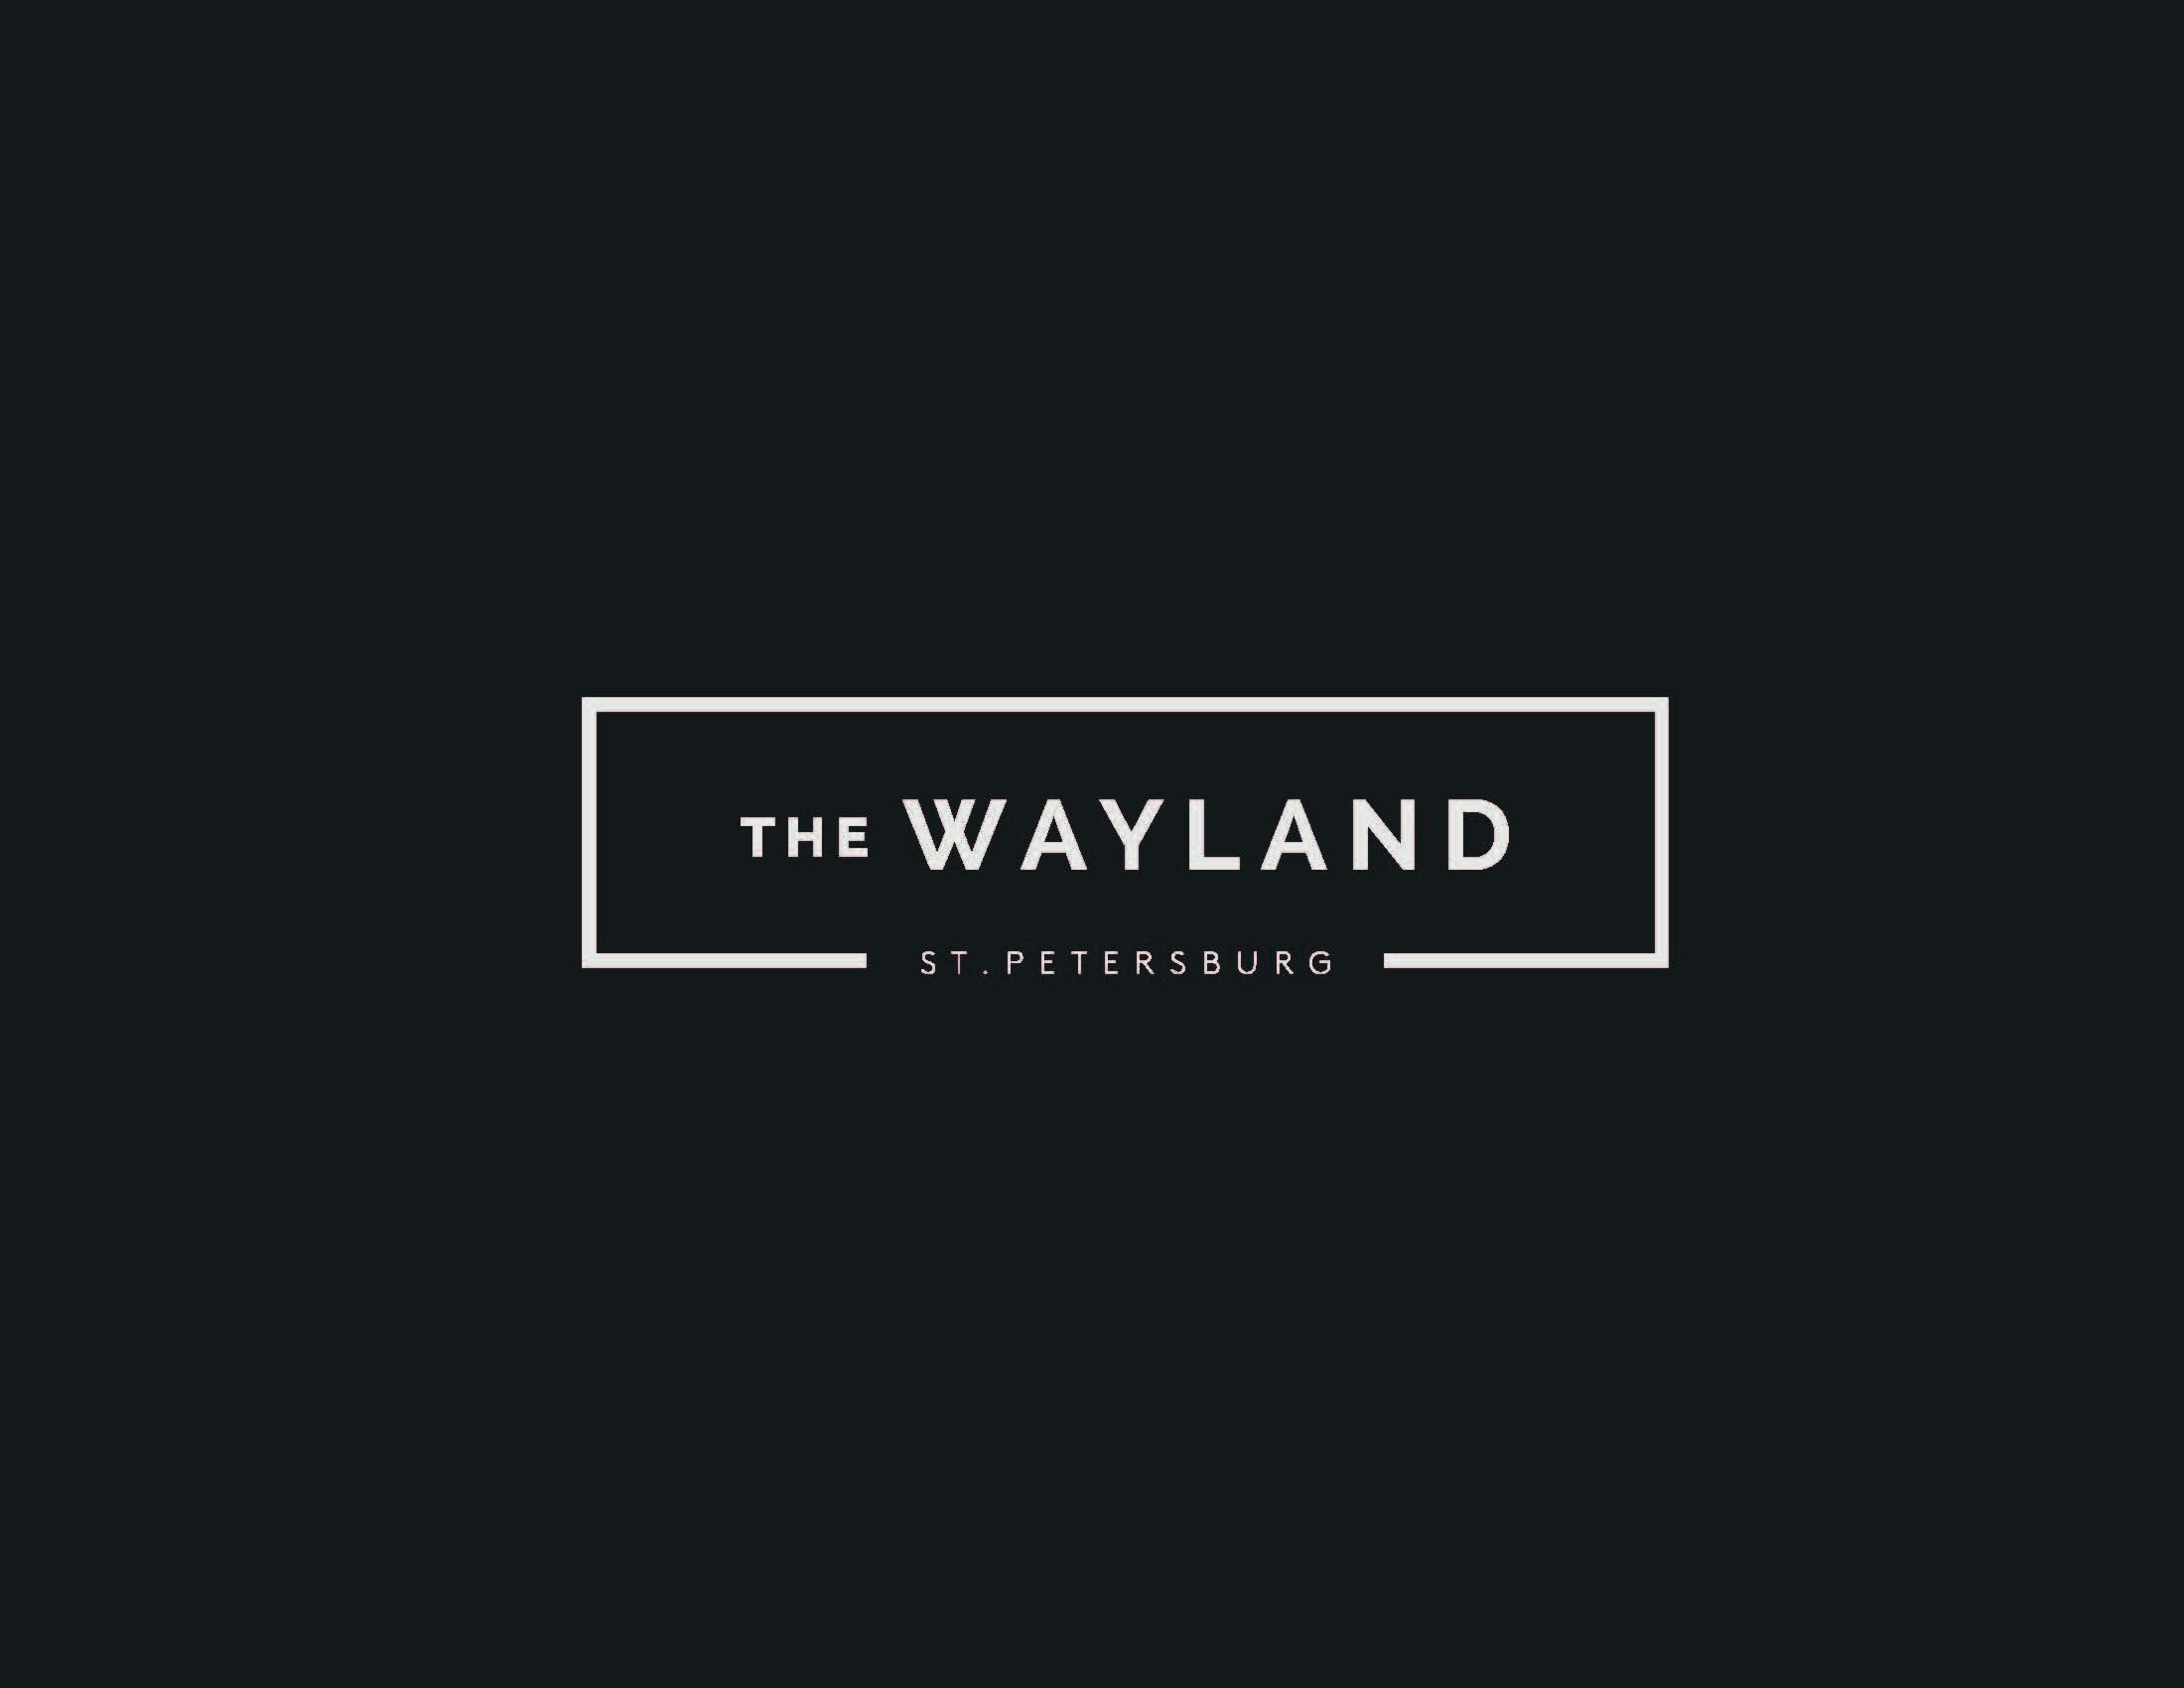 WaylandBranding_Page_12.jpg